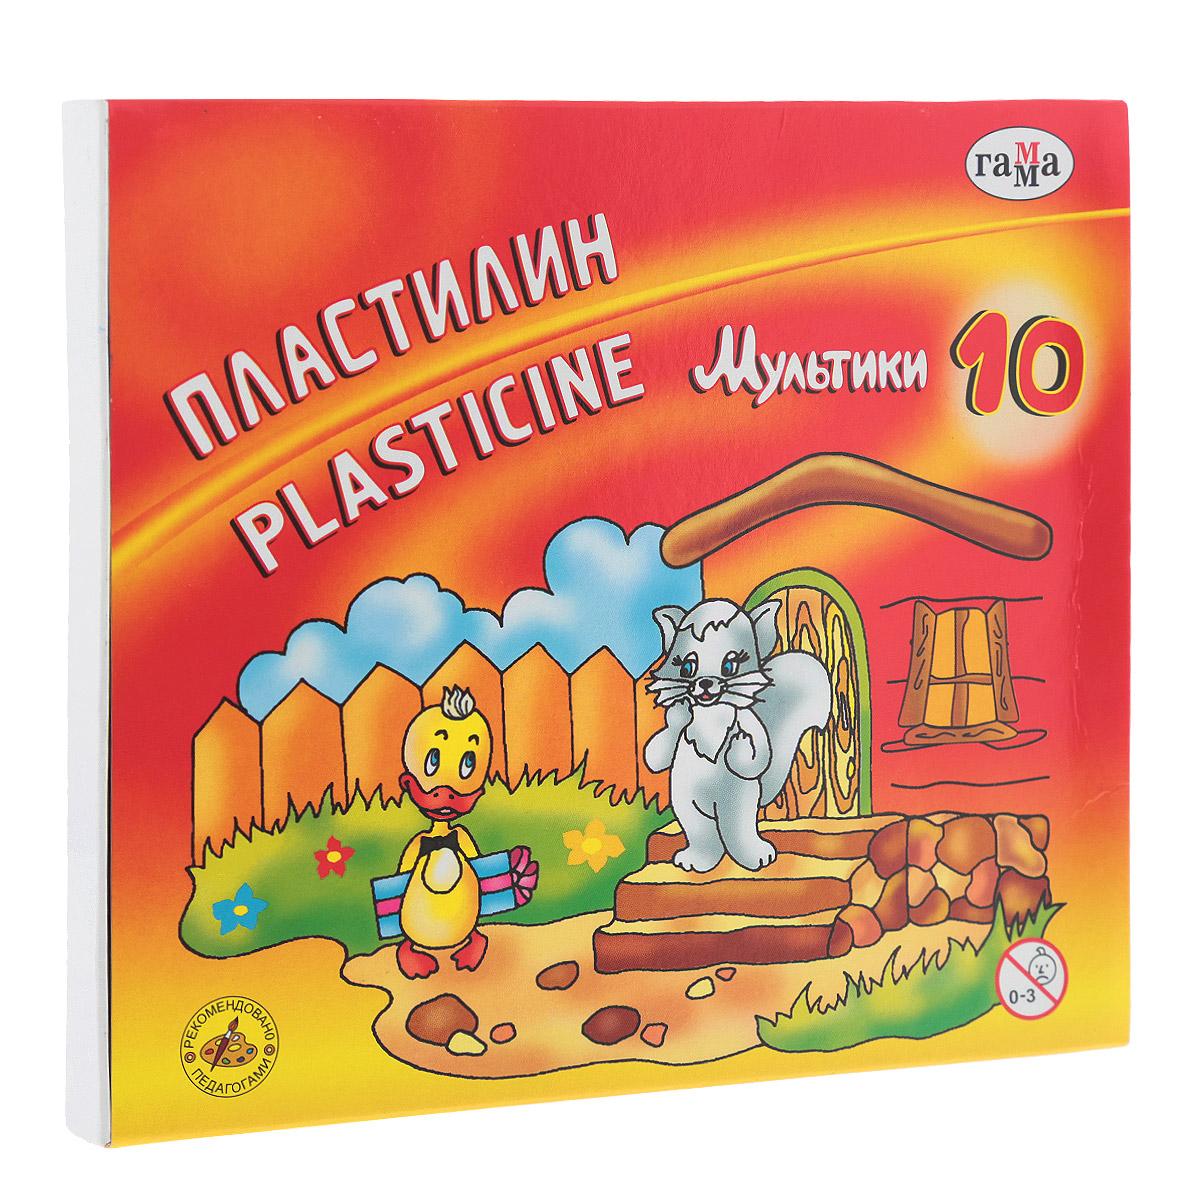 Пластилин Гамма Мультики, со стеком, 10 цветов